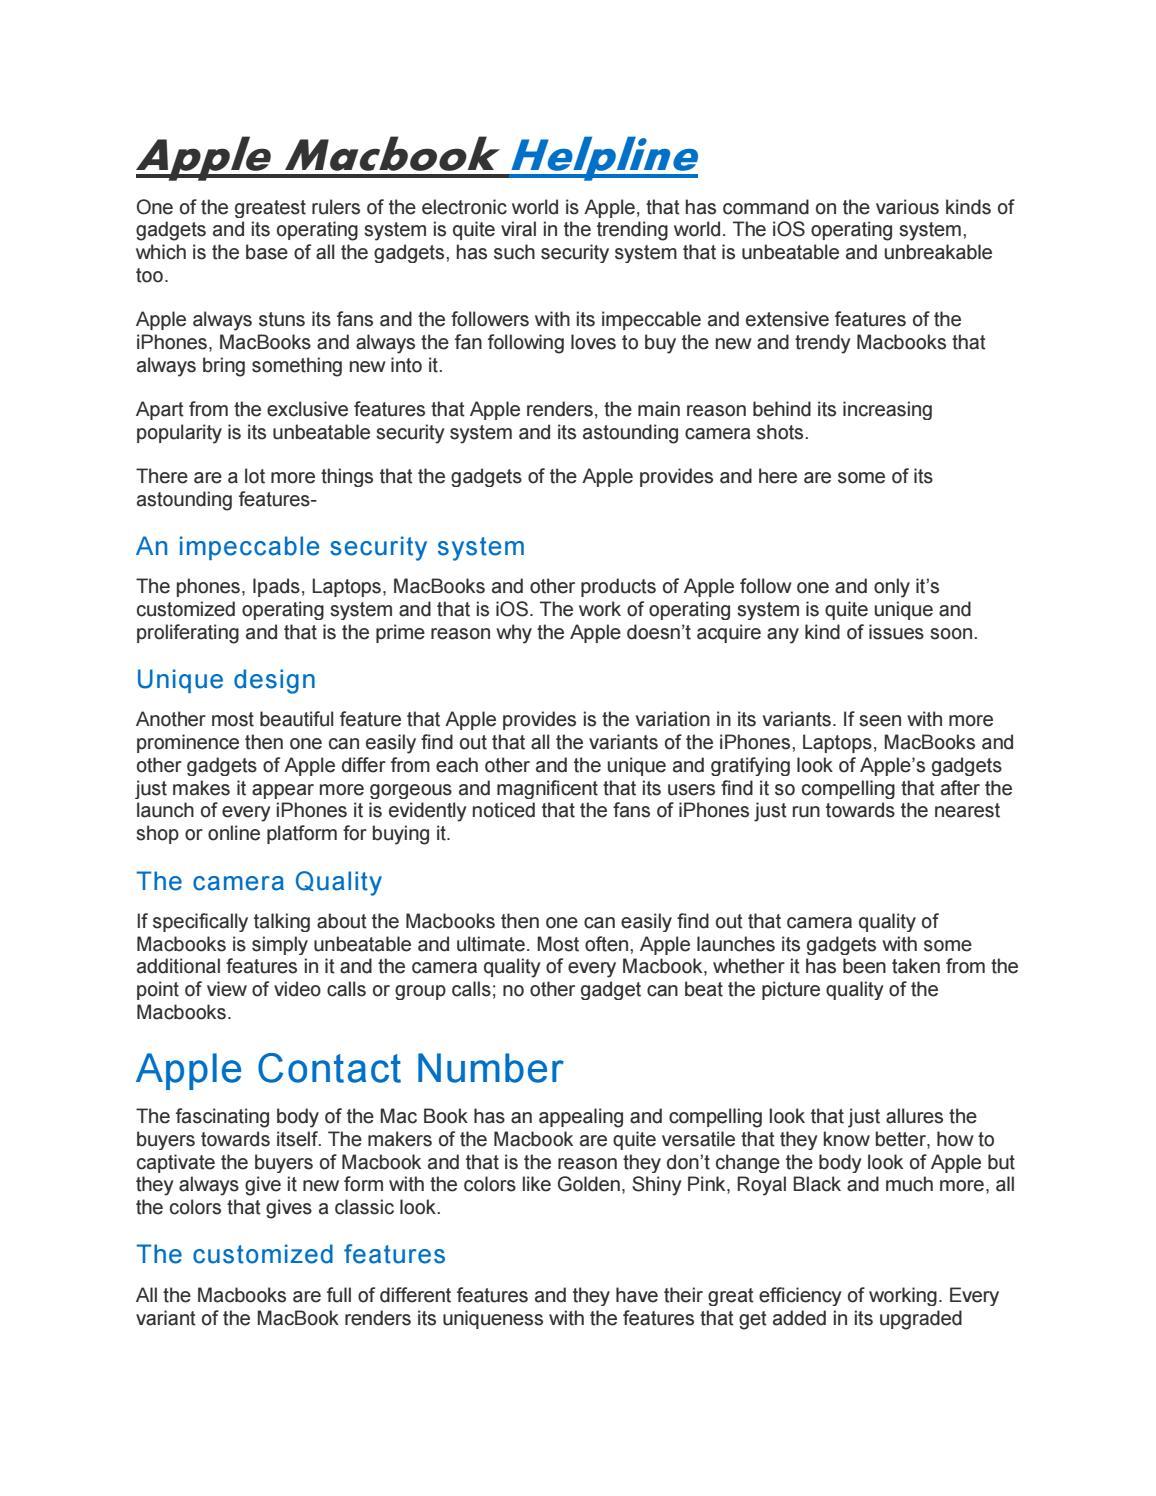 Macbook Customer Service uk by mountea332 - issuu